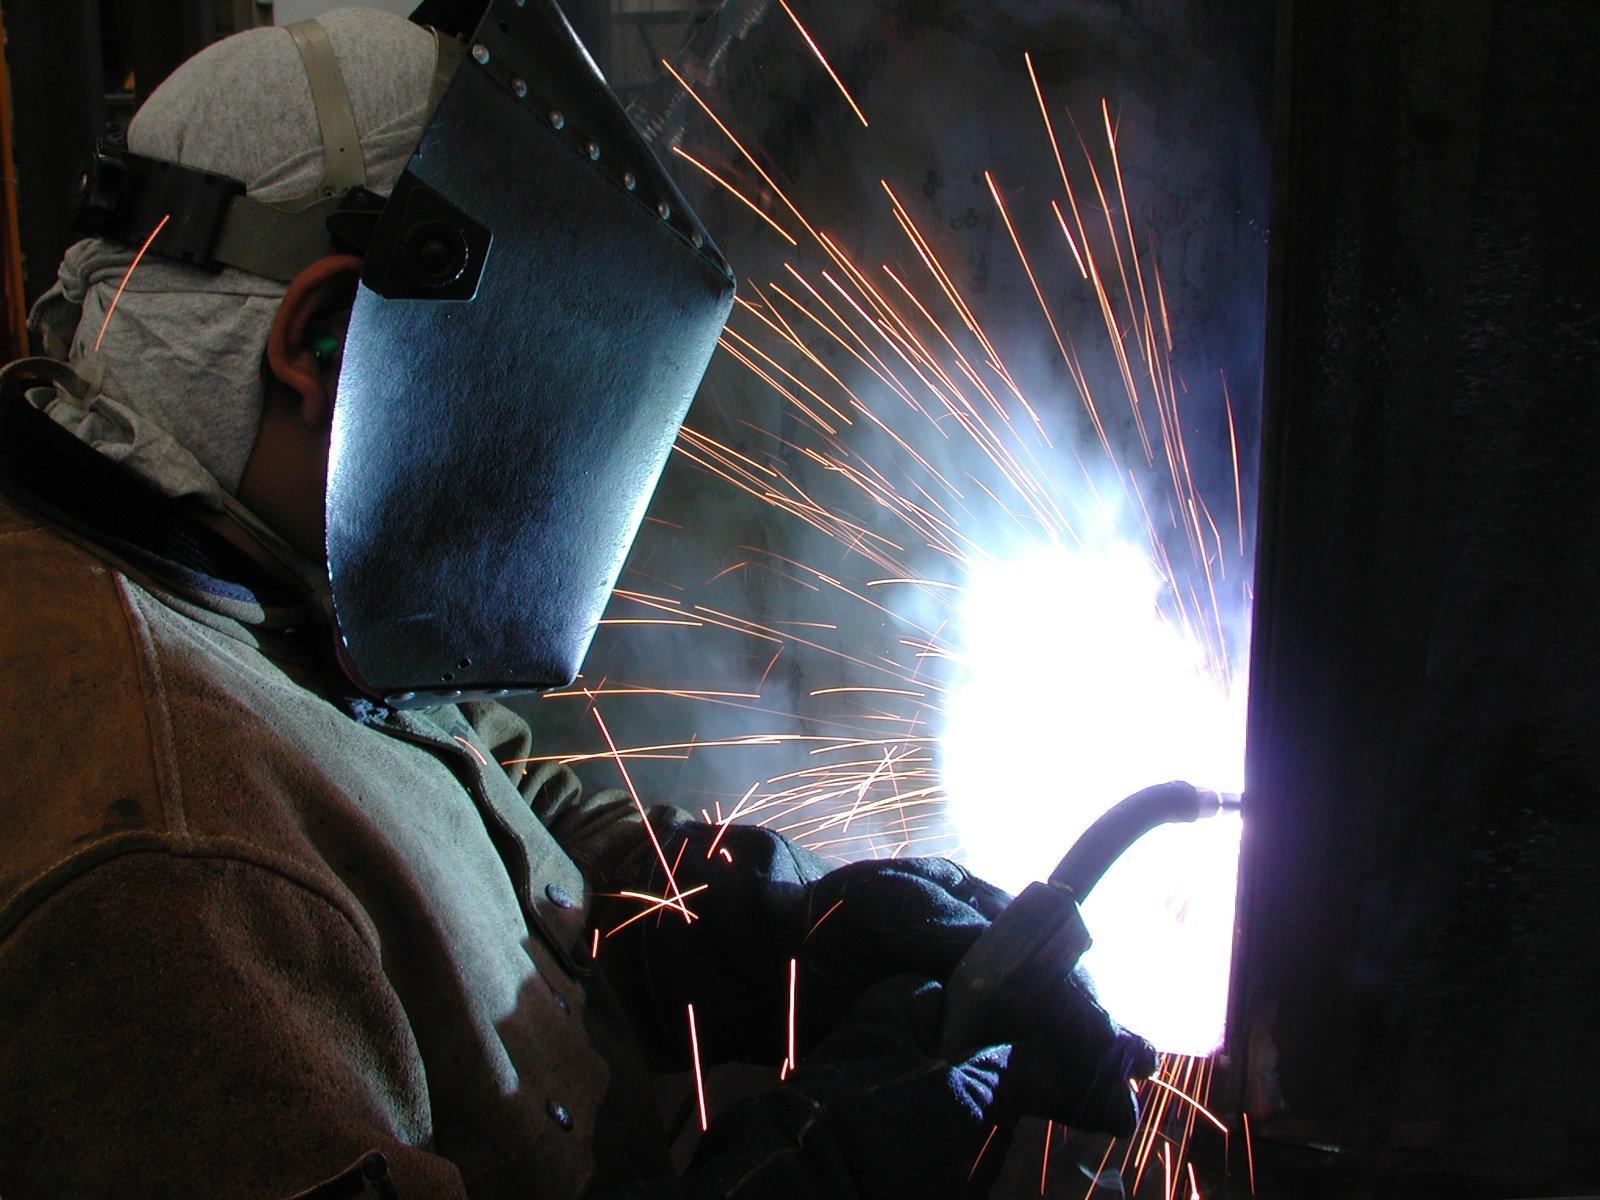 Free Welding Stock Photo Freeimages Com